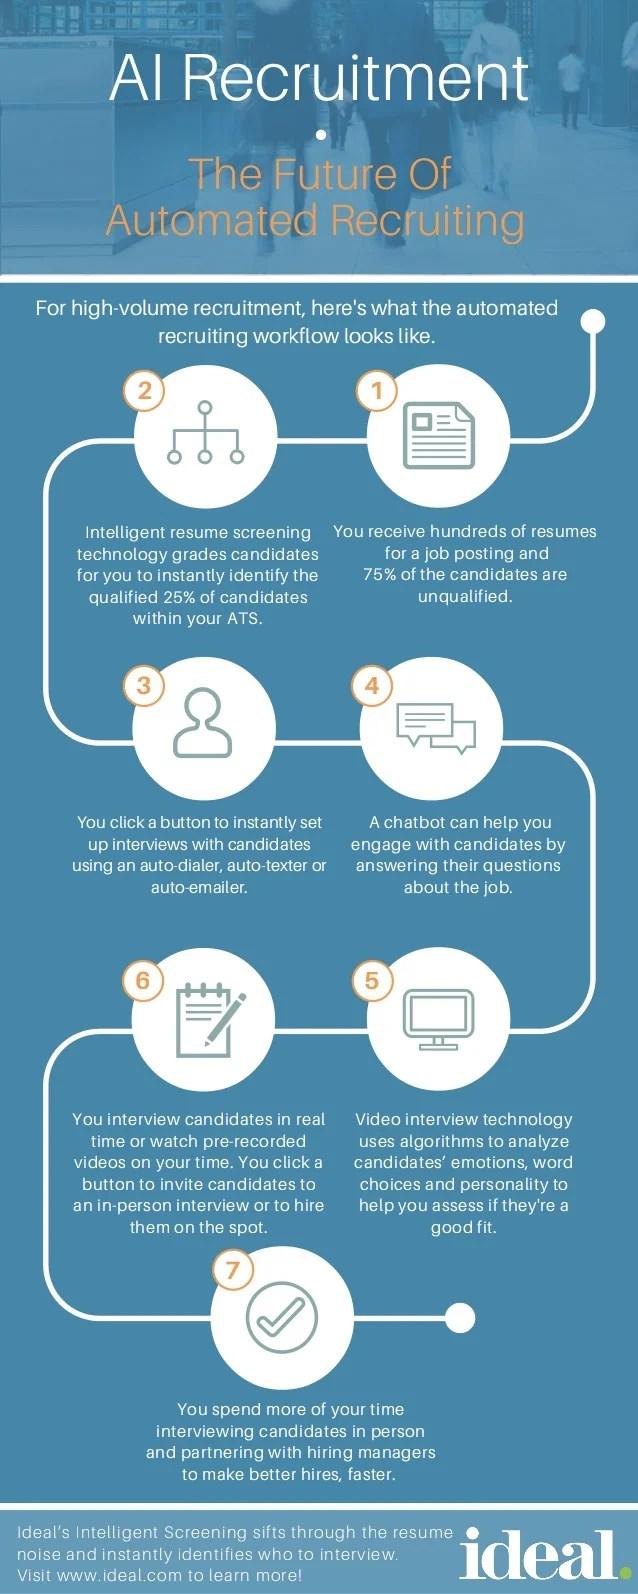 AI Recruitment The Future of Automated Recruiting